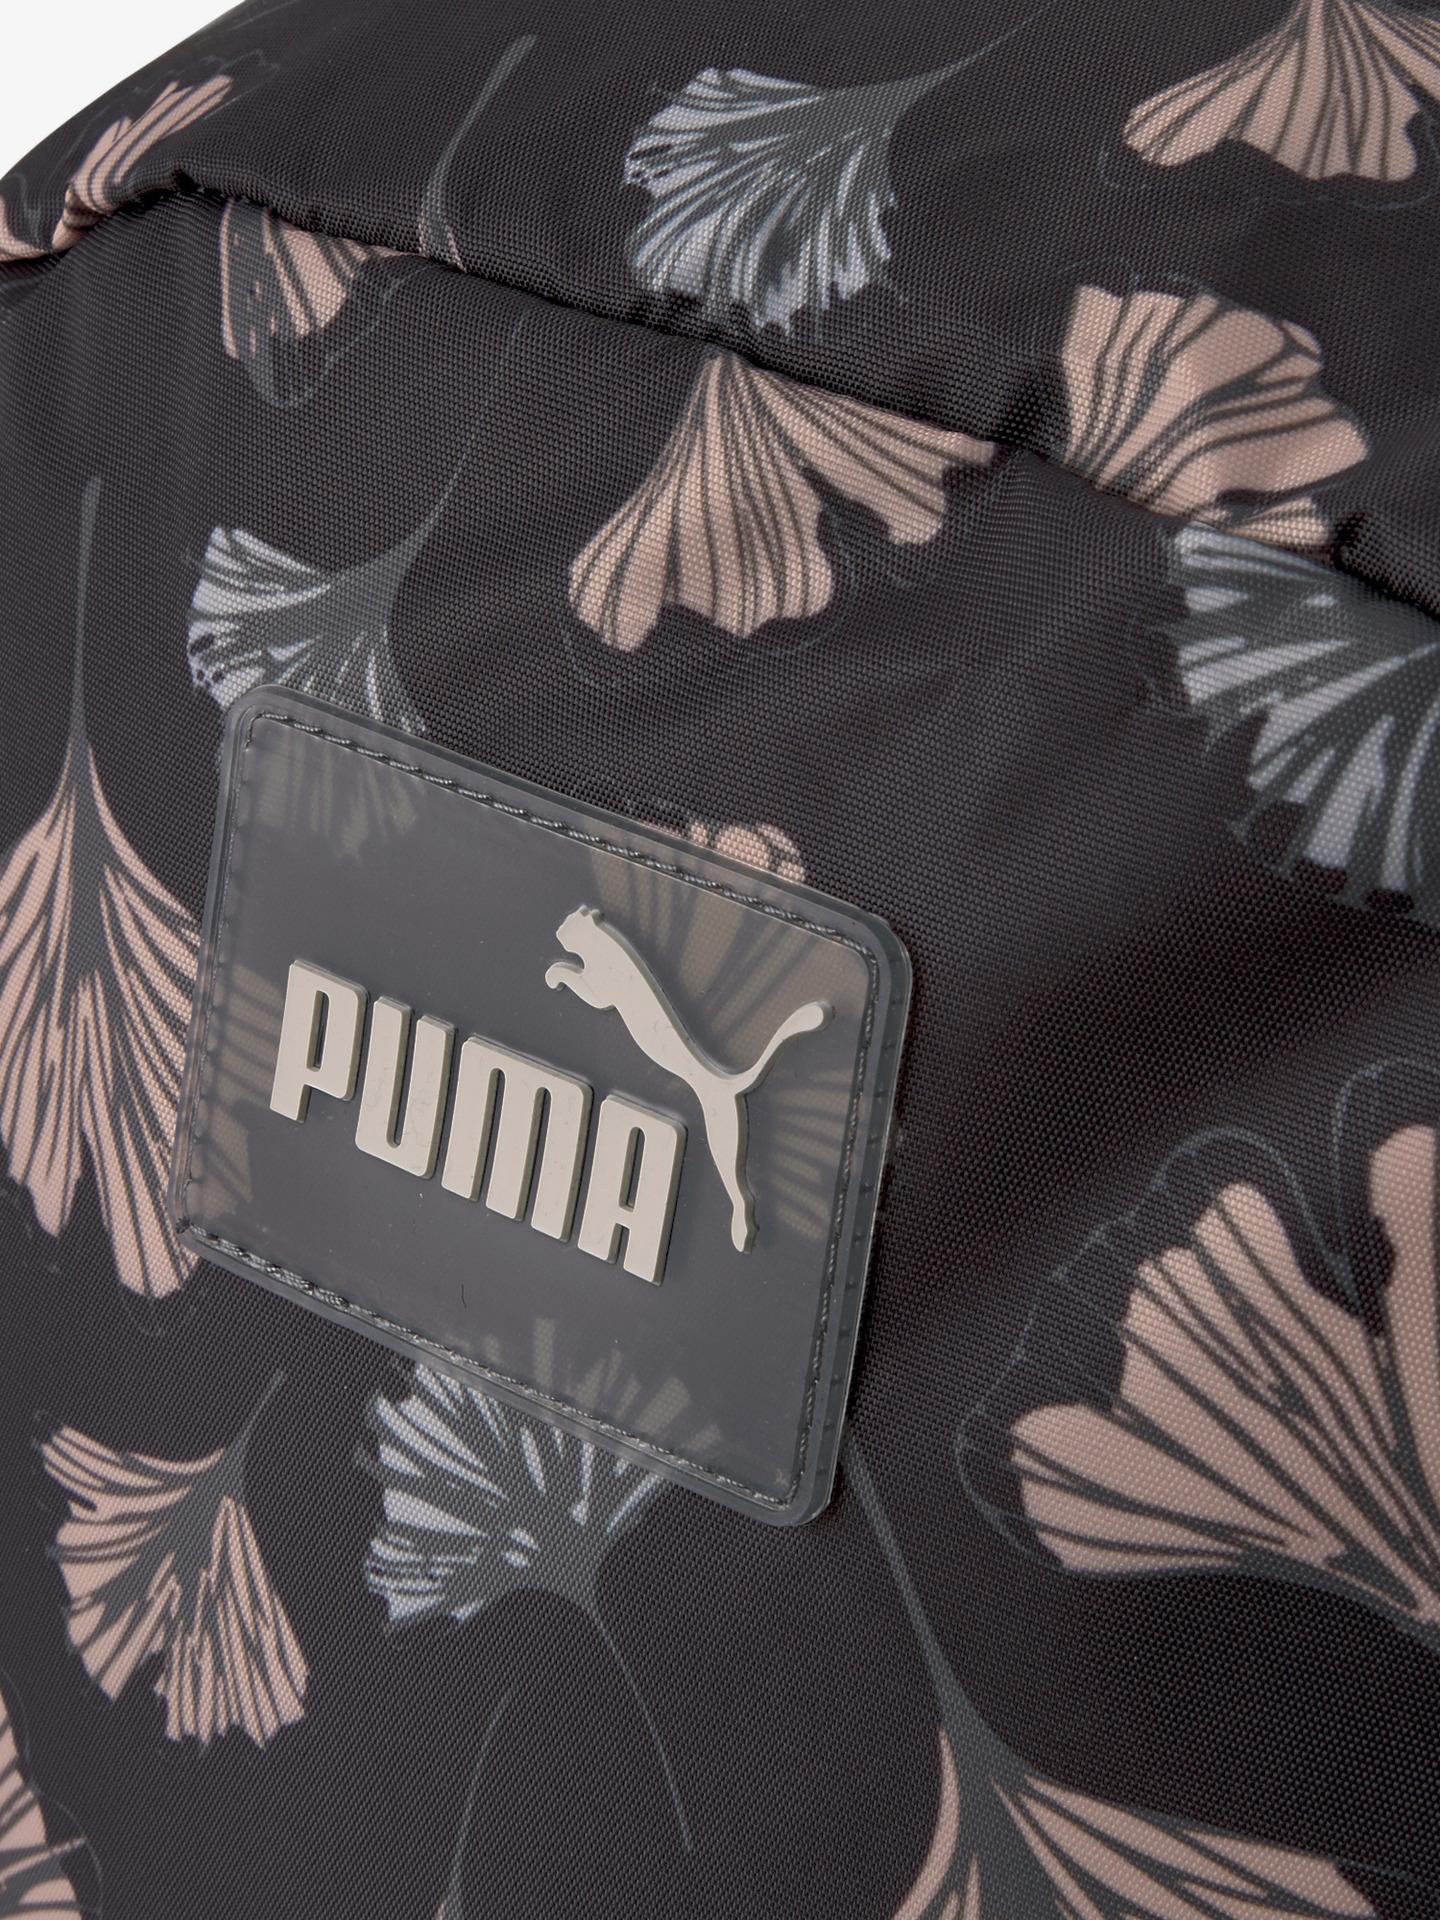 Puma Plecak damski czarny  Pop